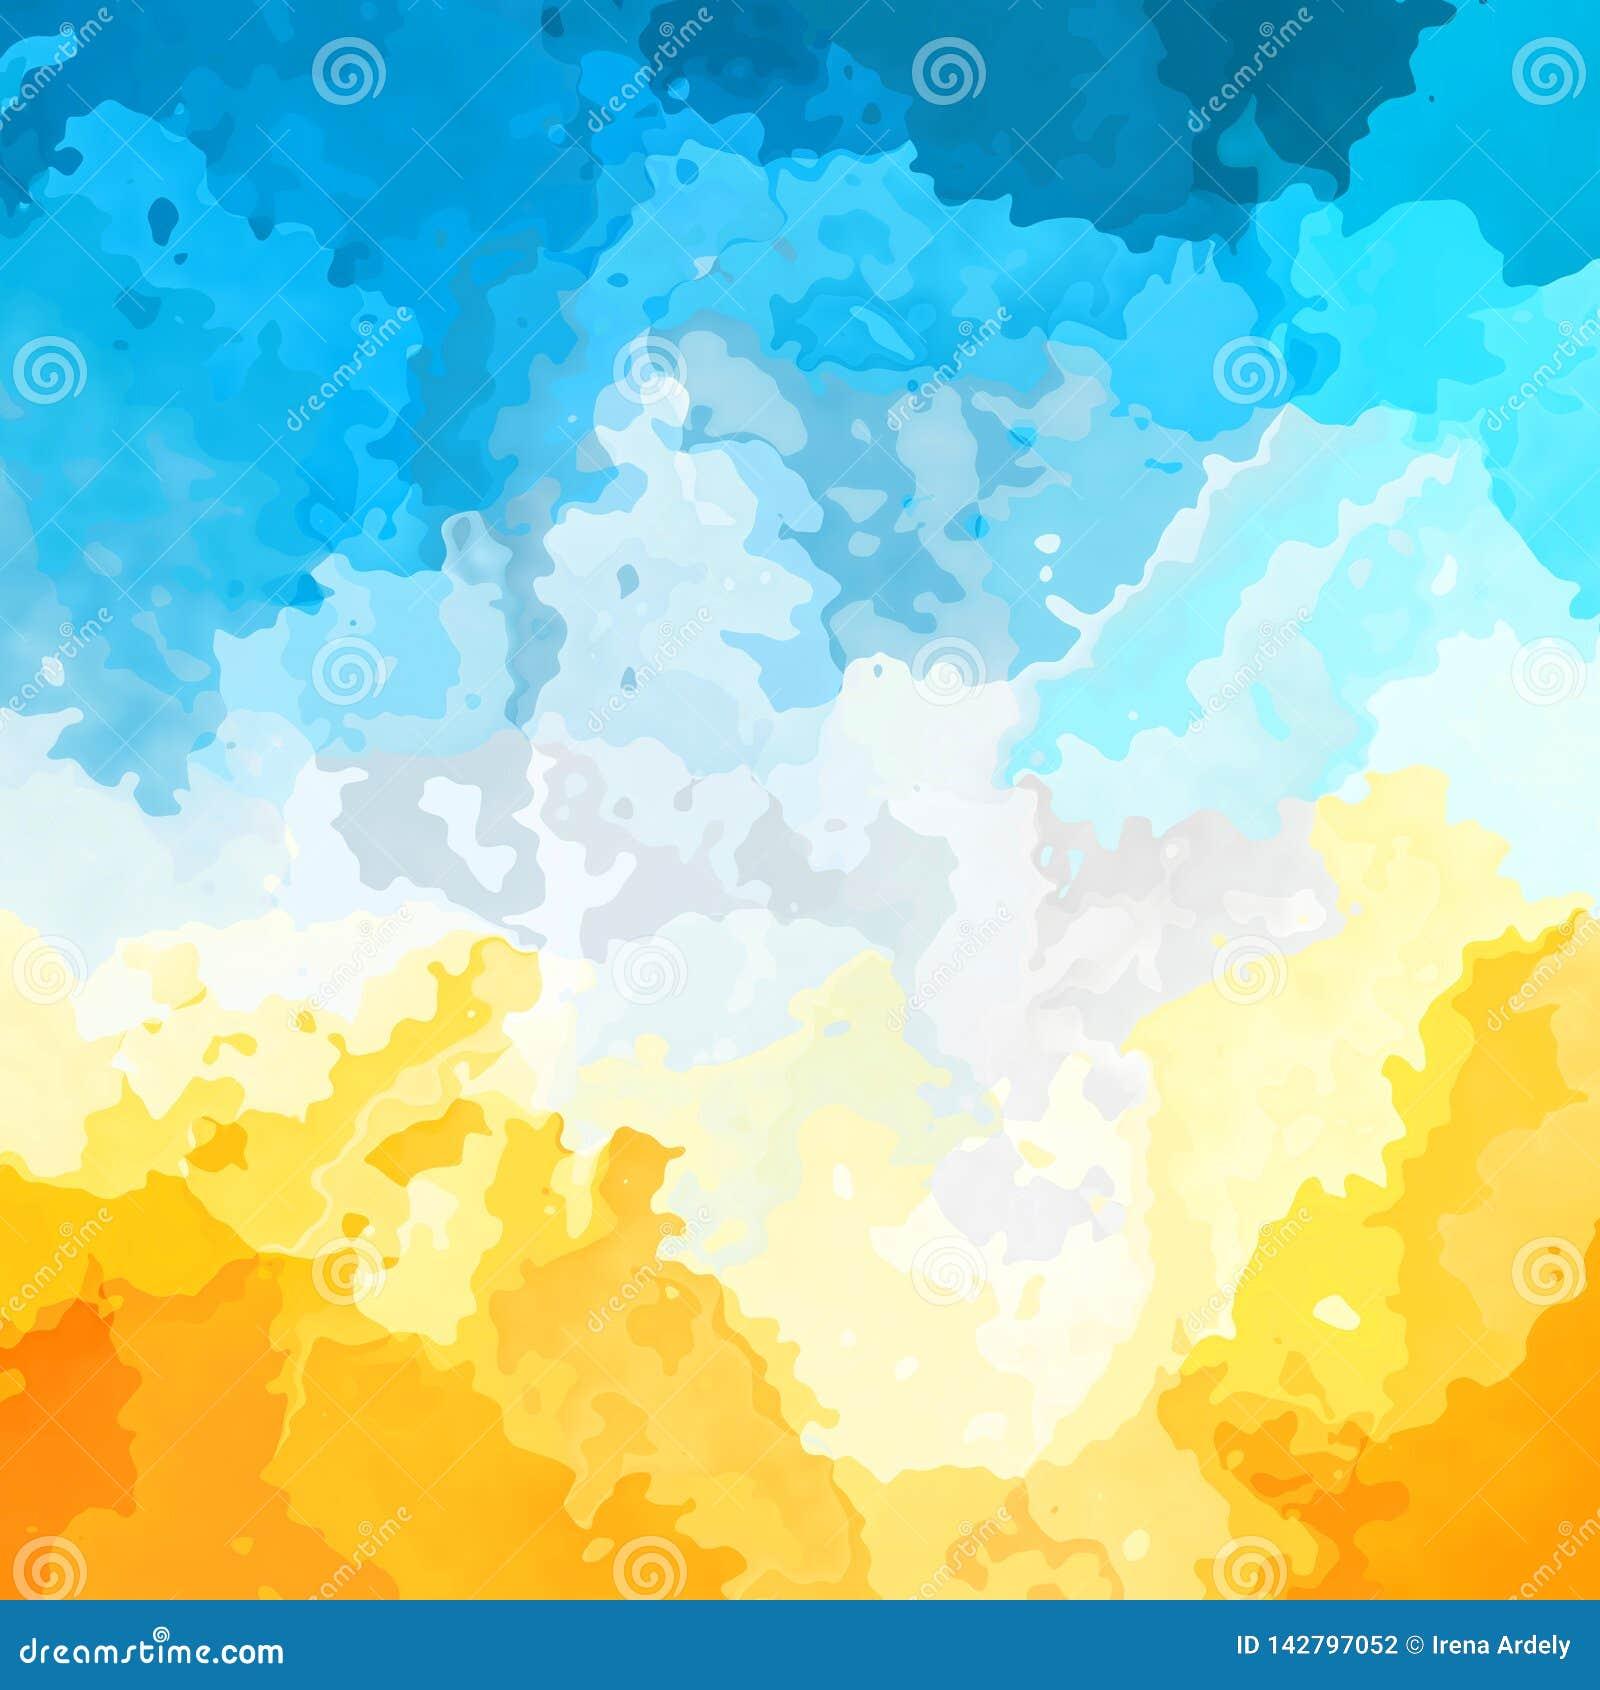 Modern Art Yellow And Blue